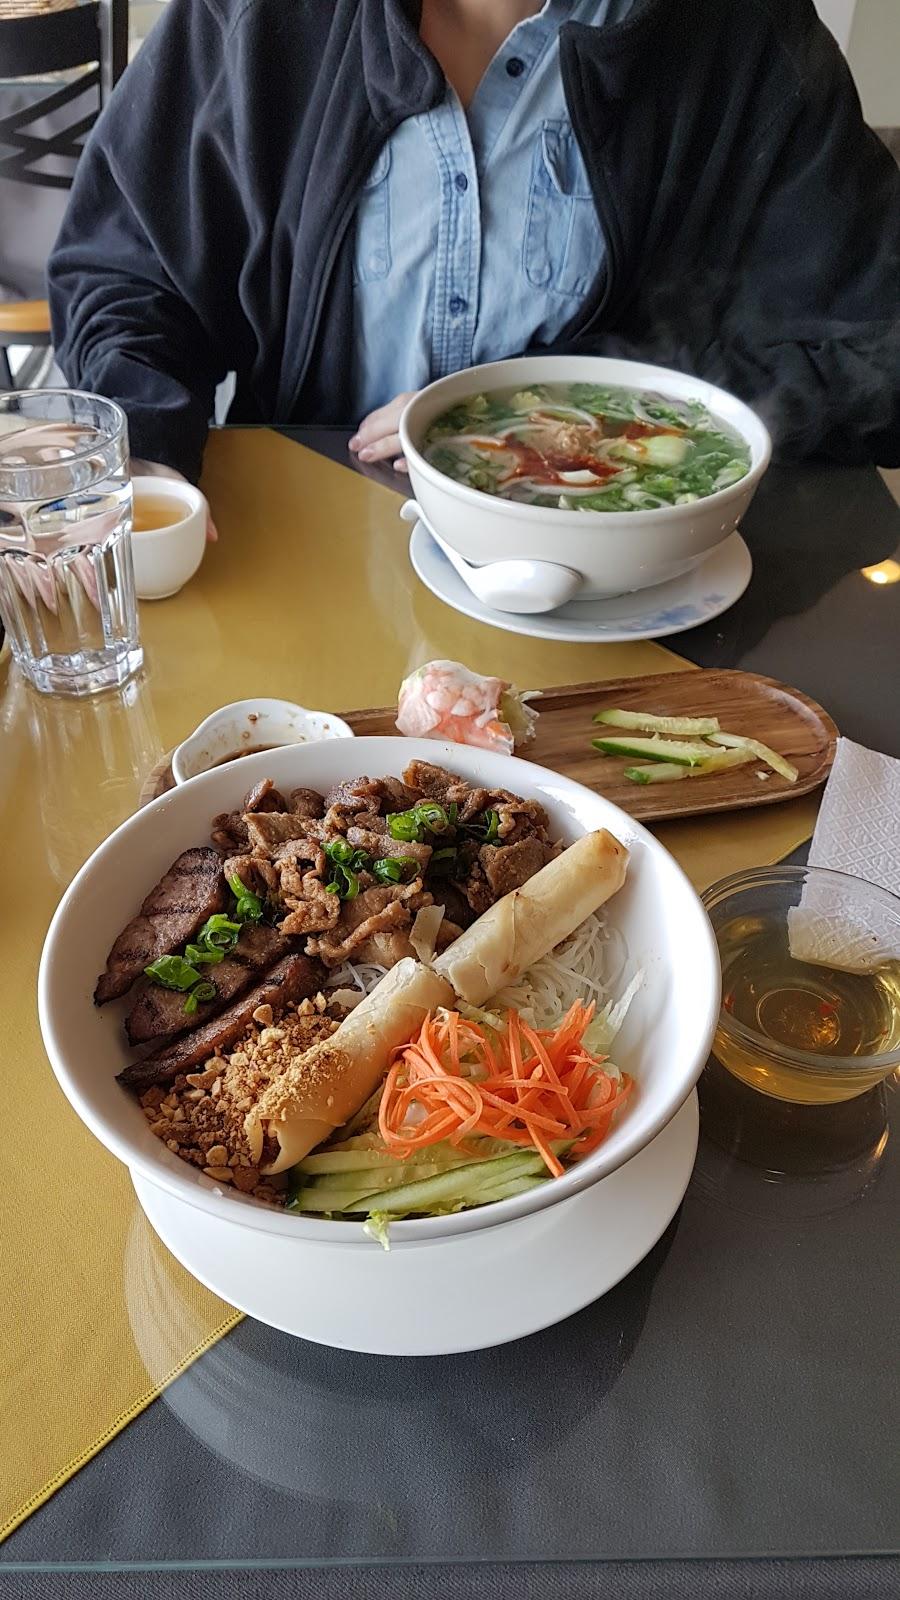 Thang Long Restaurant 304 Main St S Airdrie Ab T4b 3m2 Canada